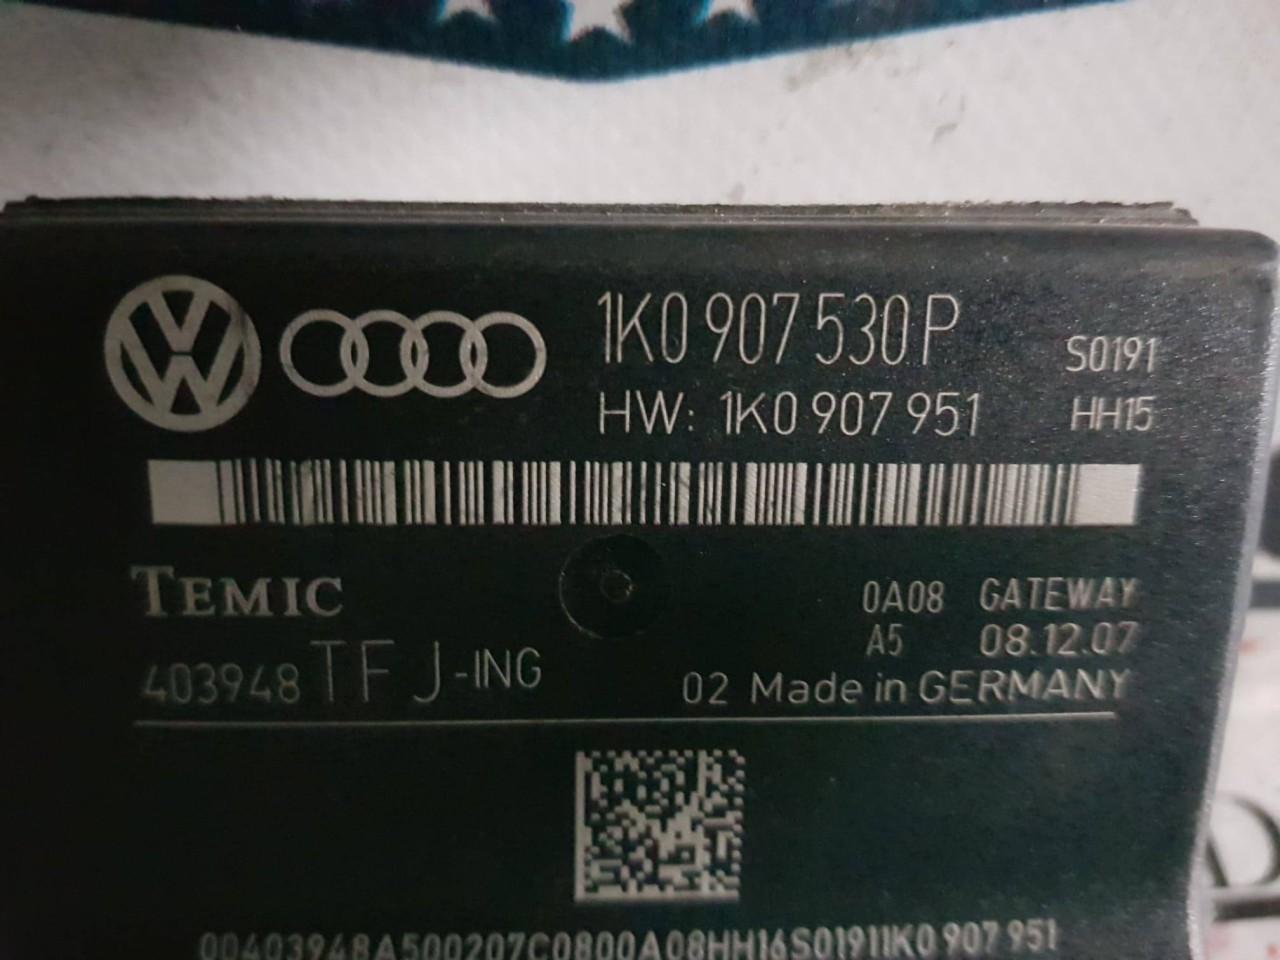 Modul control central Gateway Audi A3 8P 1k0907530p